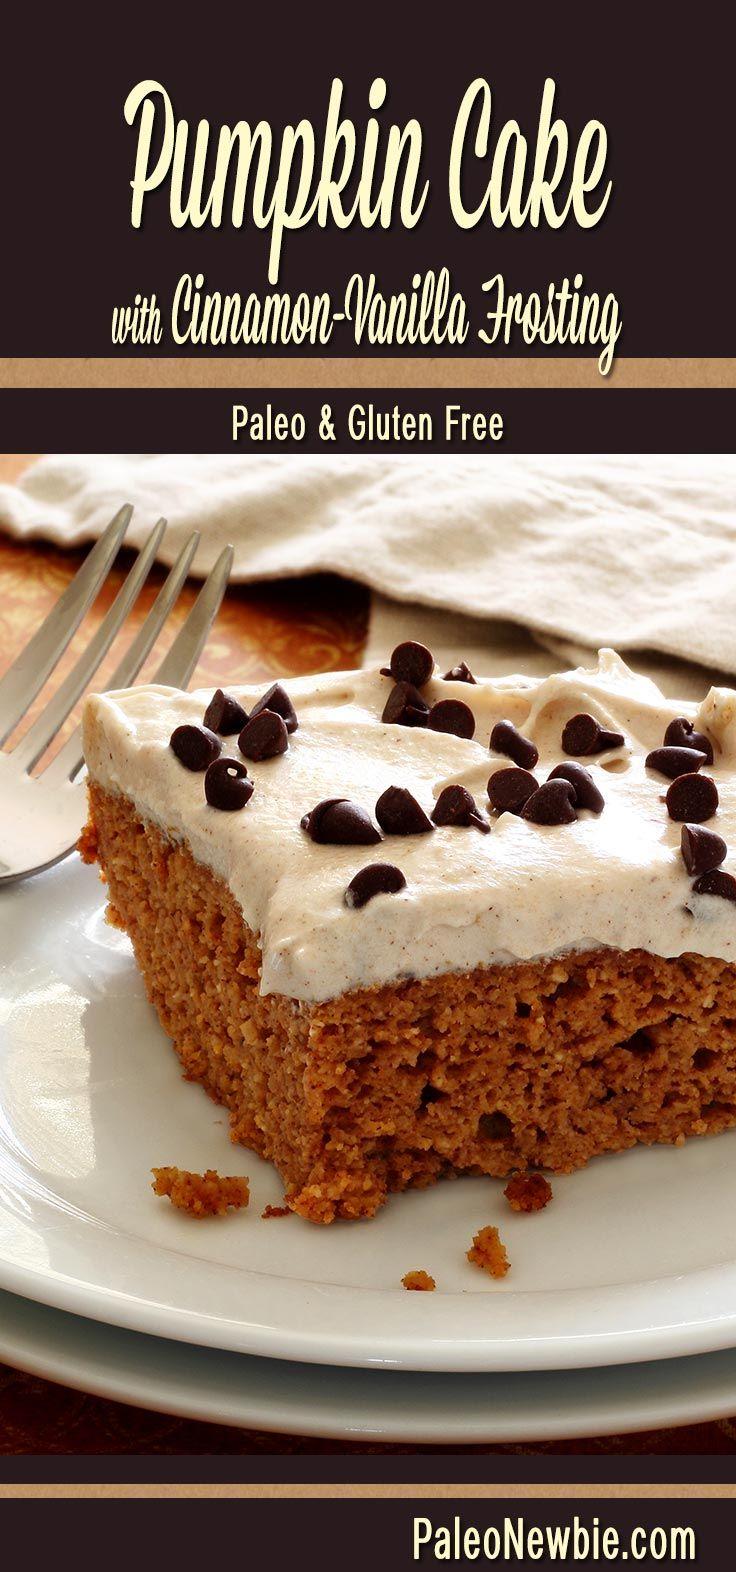 Glutenfree Cinnamon Vanilla and Frosting Cakes Pumpkin Cakes  Cake Pumpkin   air jordan Paleo list with Moist sites   Recipe